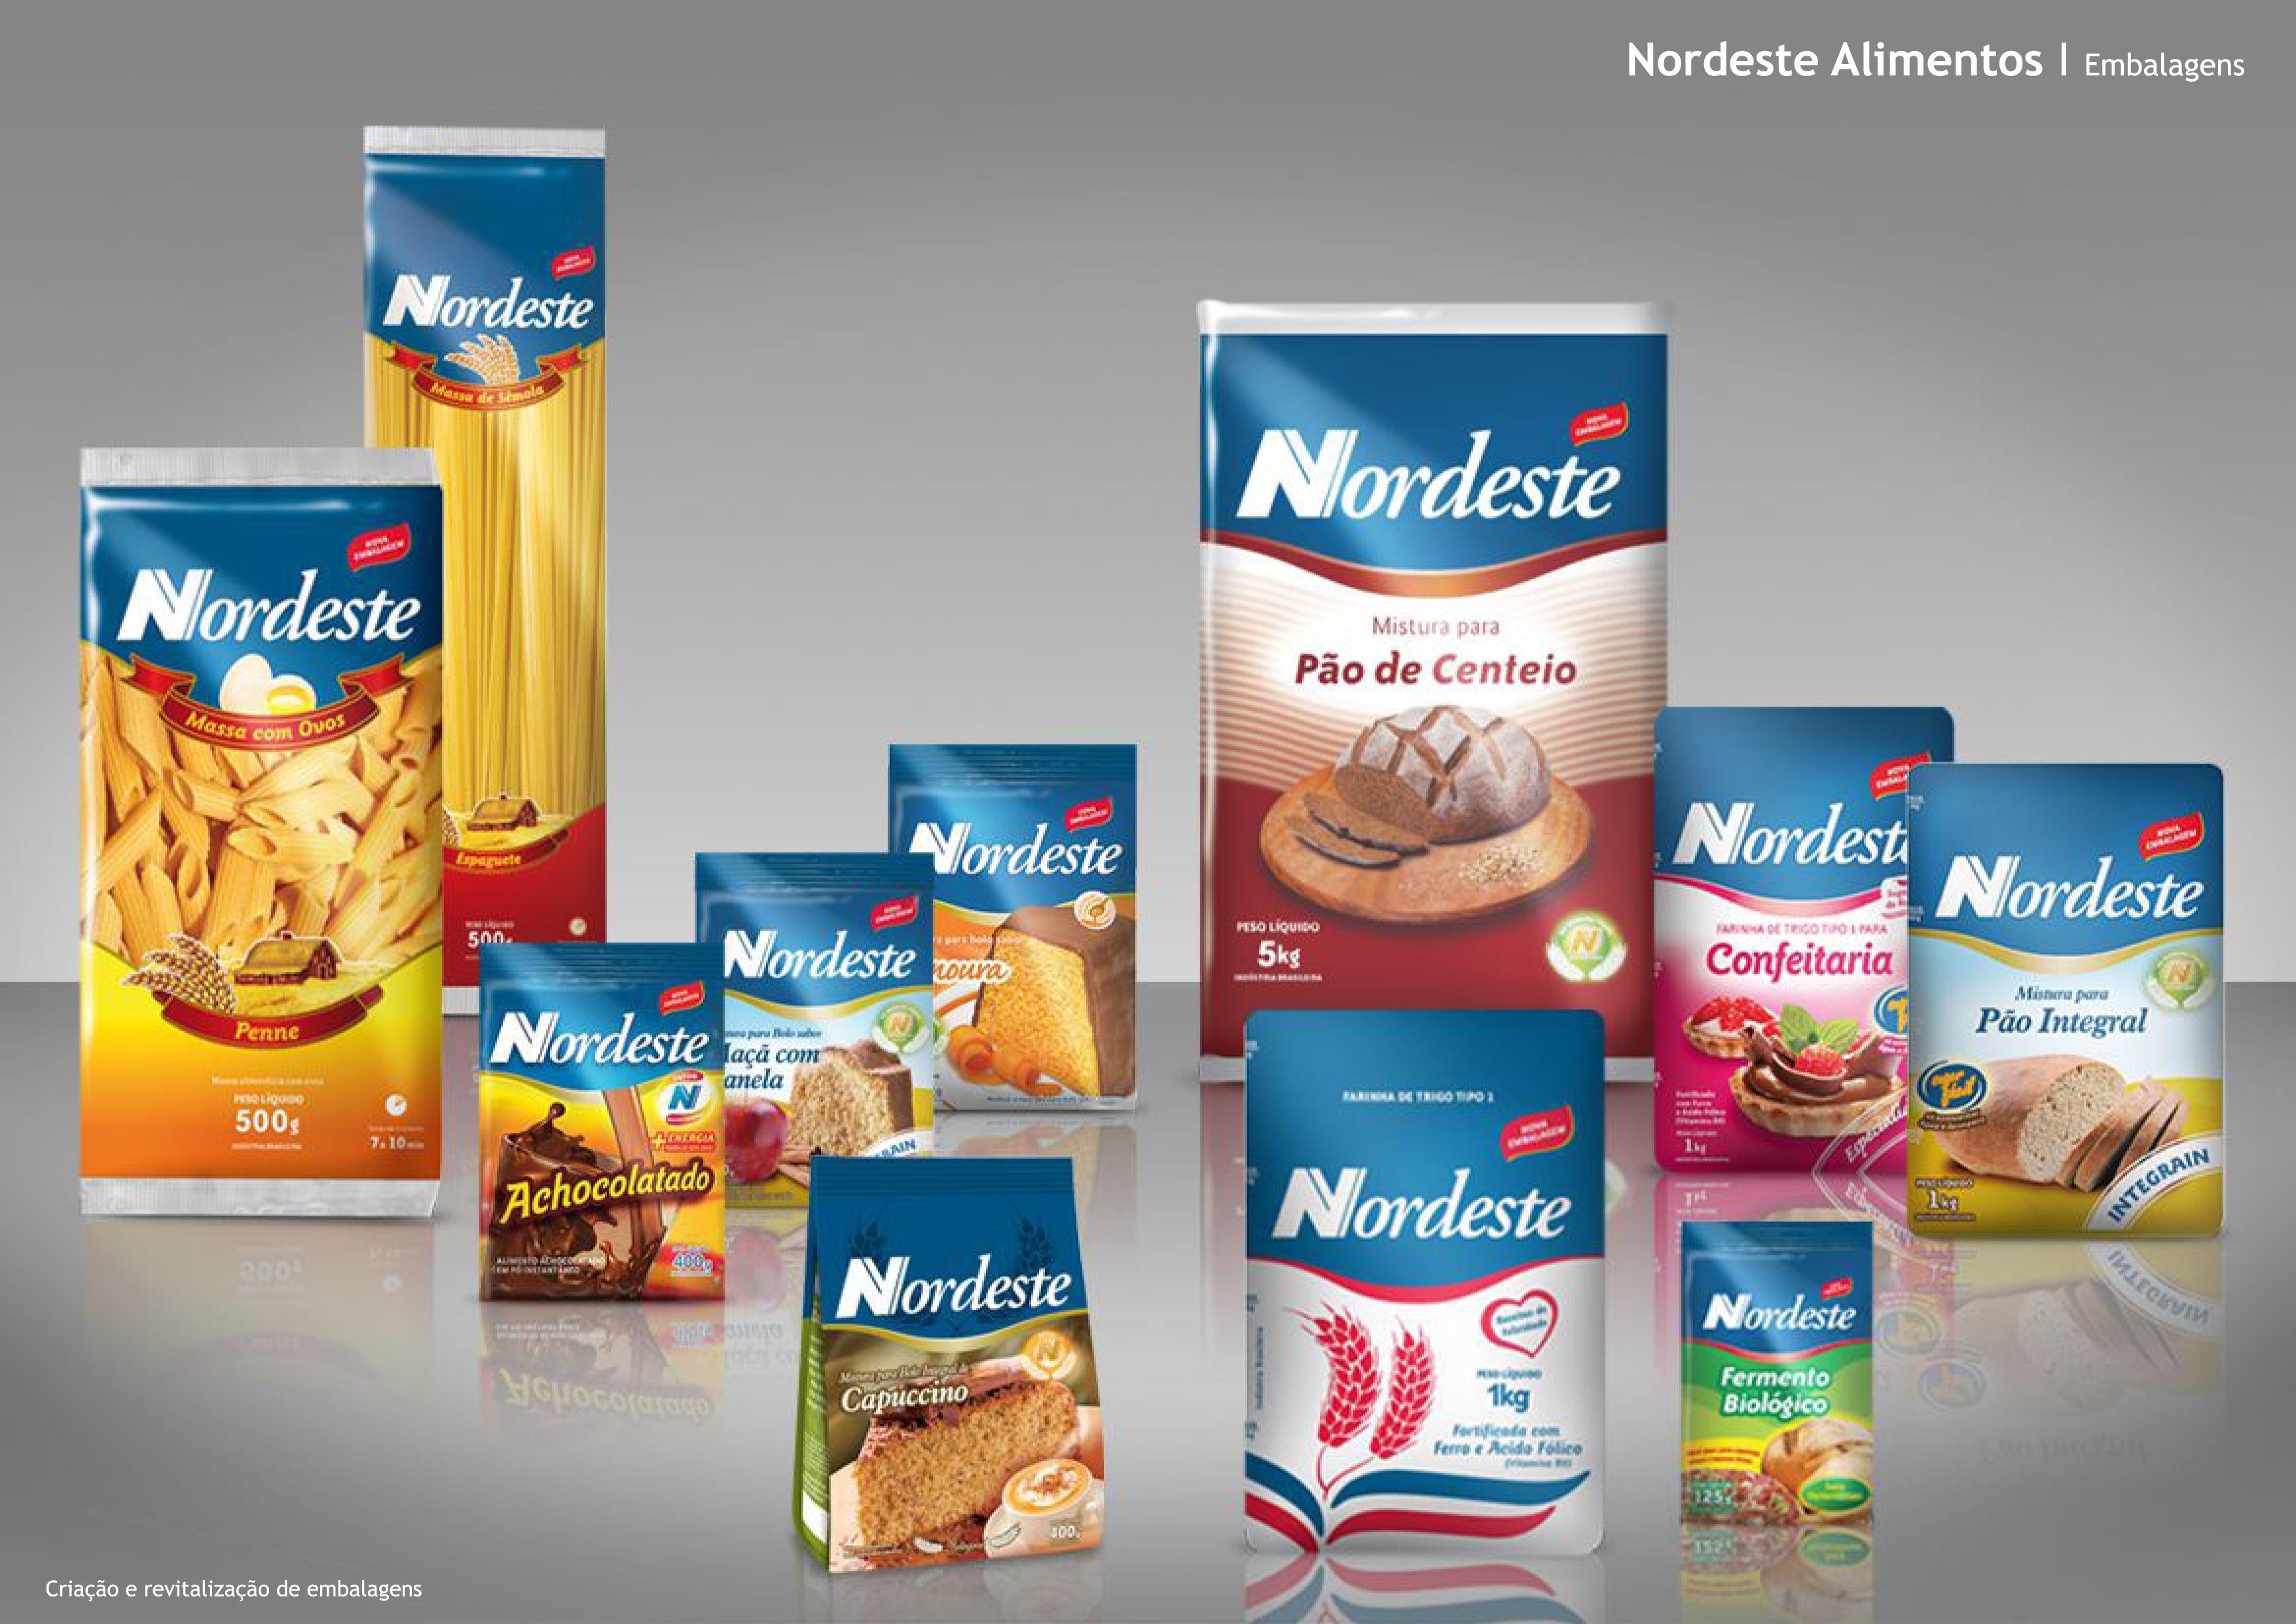 Nordeste Alimentos - Embalagens